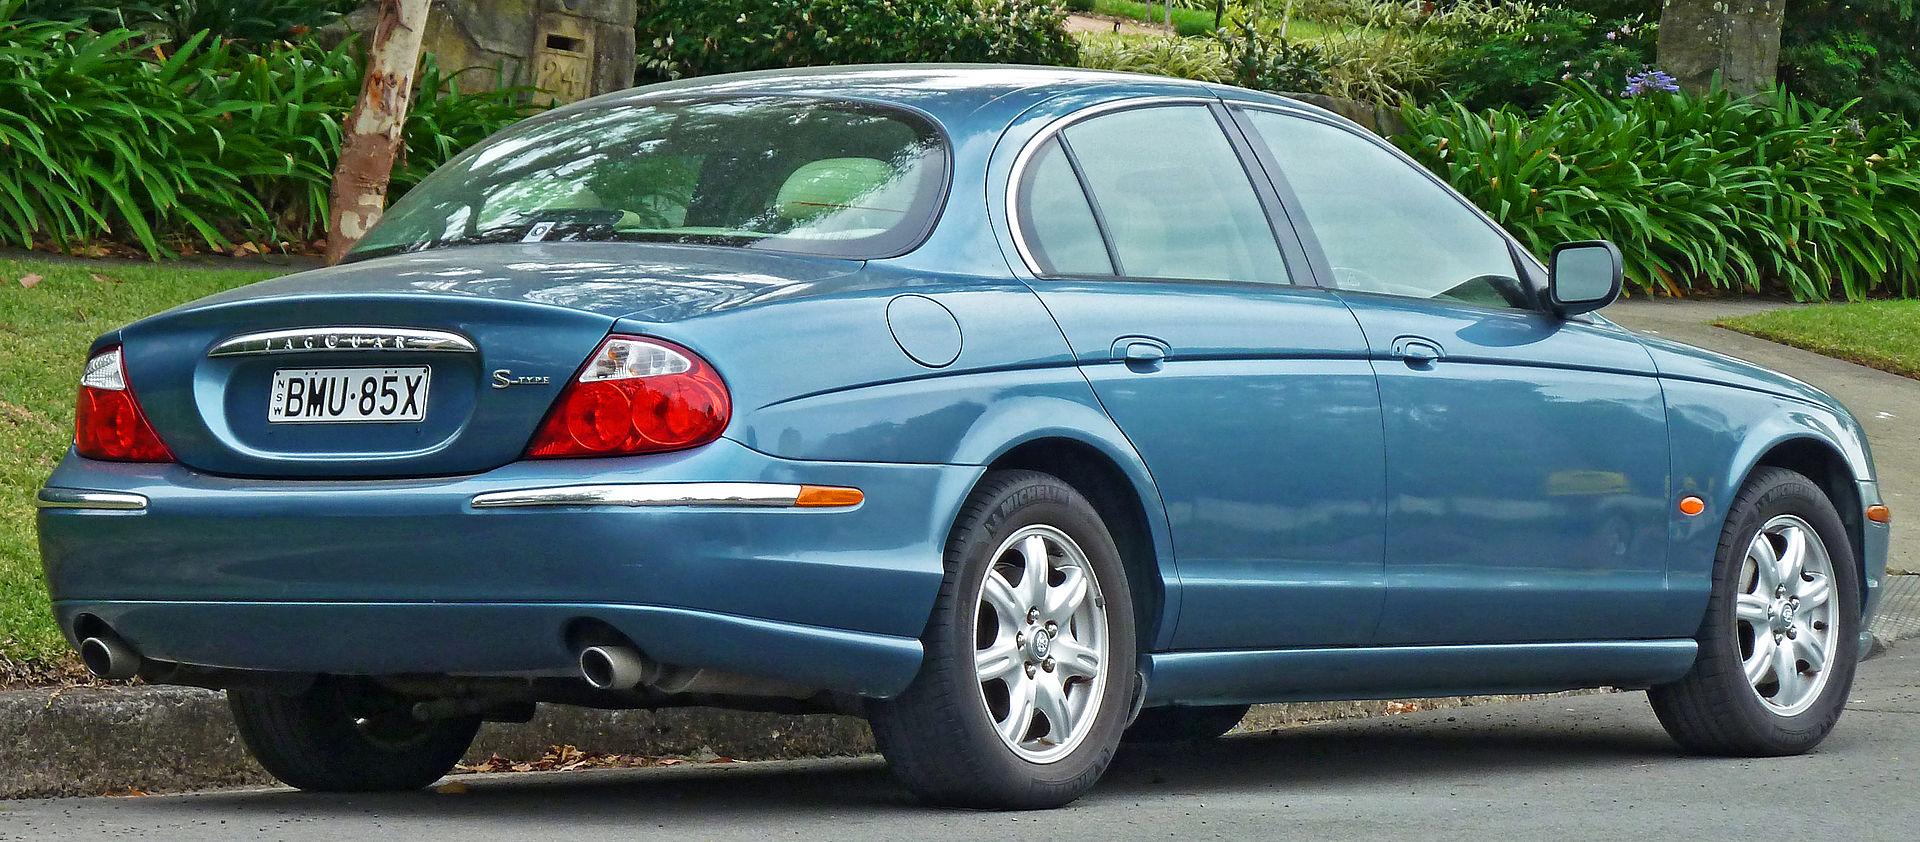 Jaguar S-Type I Restyling 2004 - 2008 Sedan #7